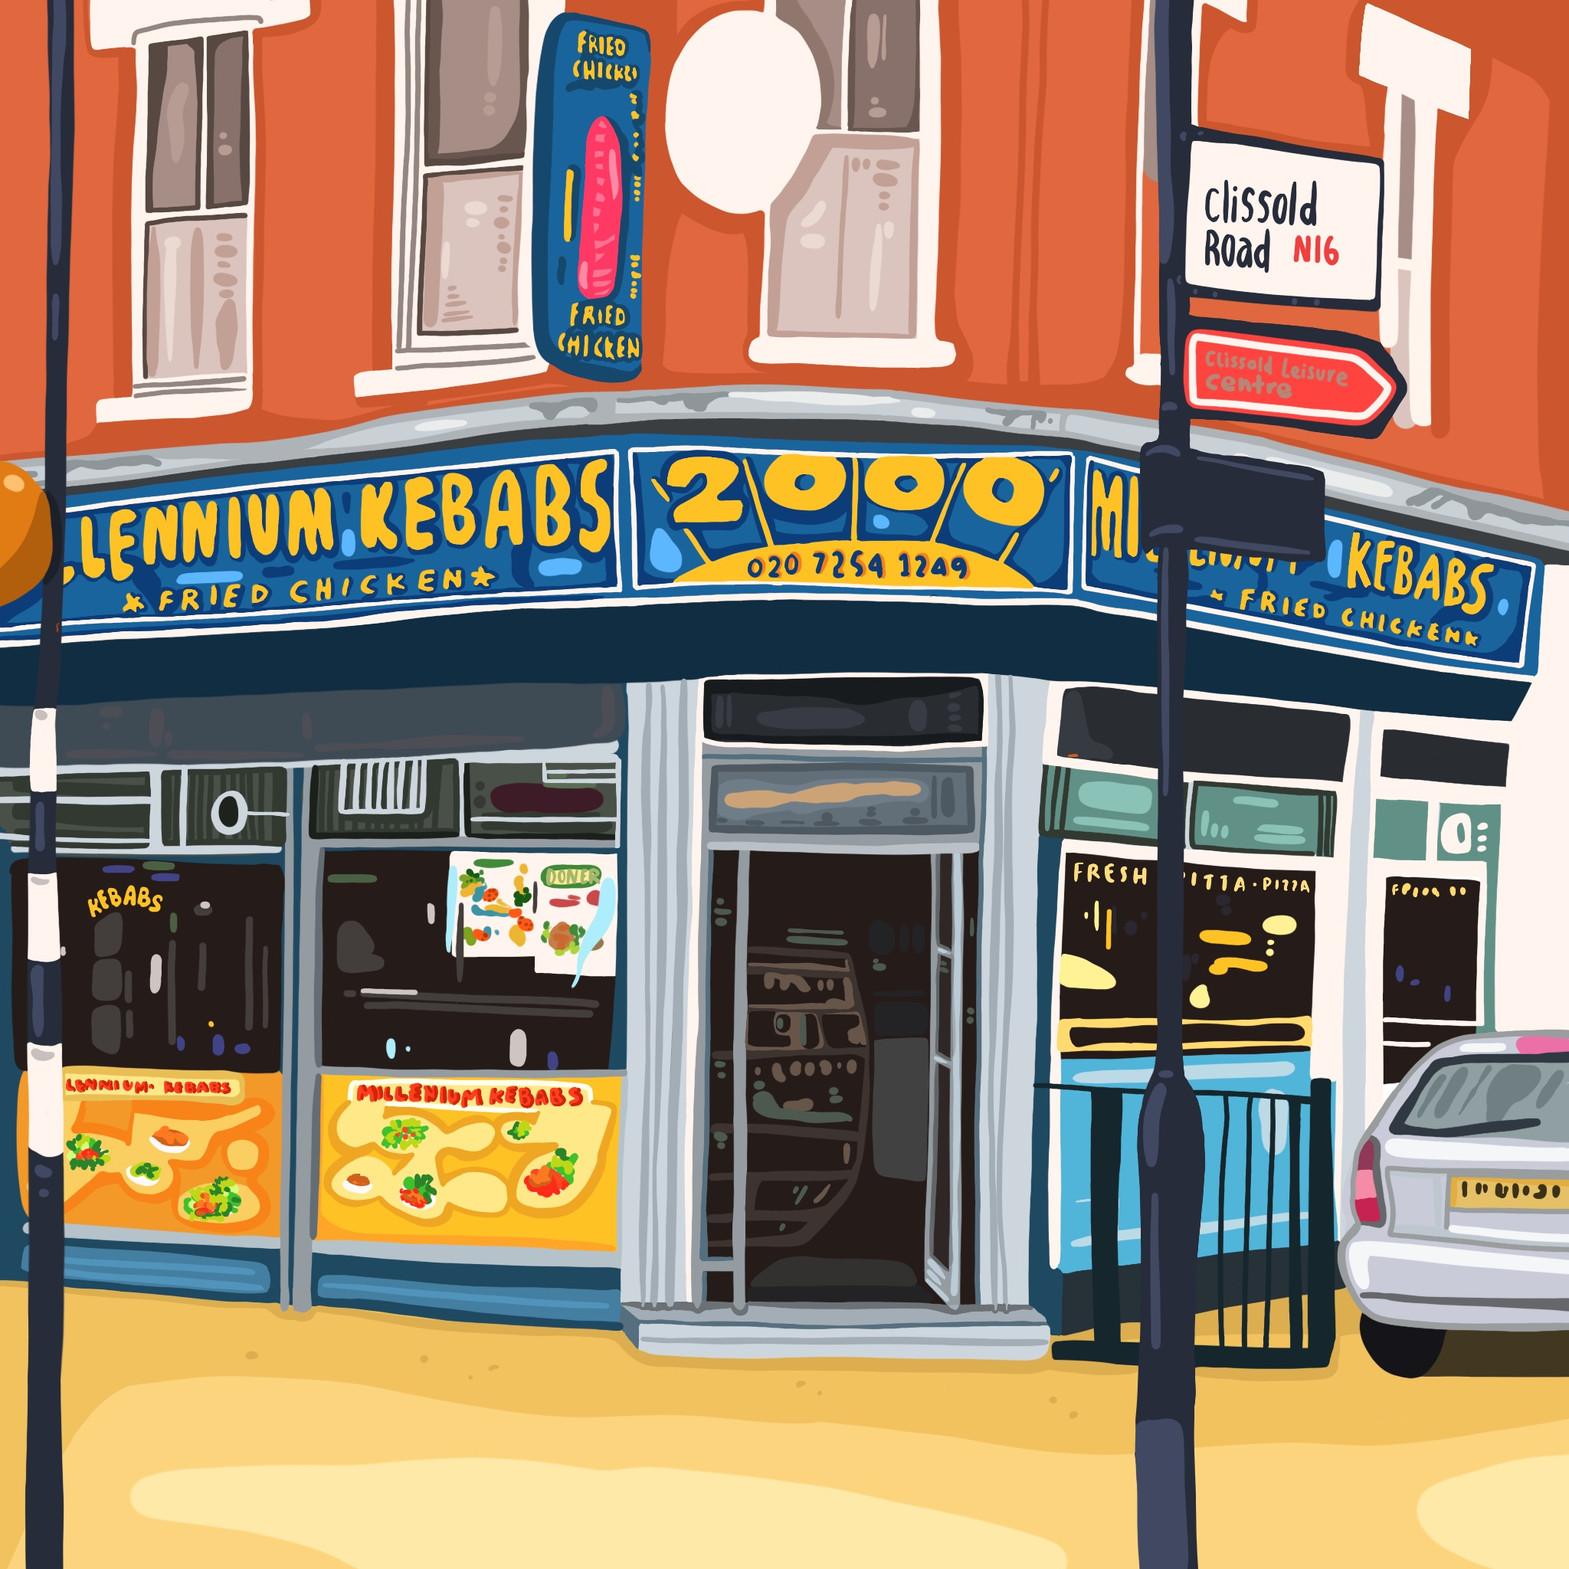 Millennium Kebabs 2000.jpg